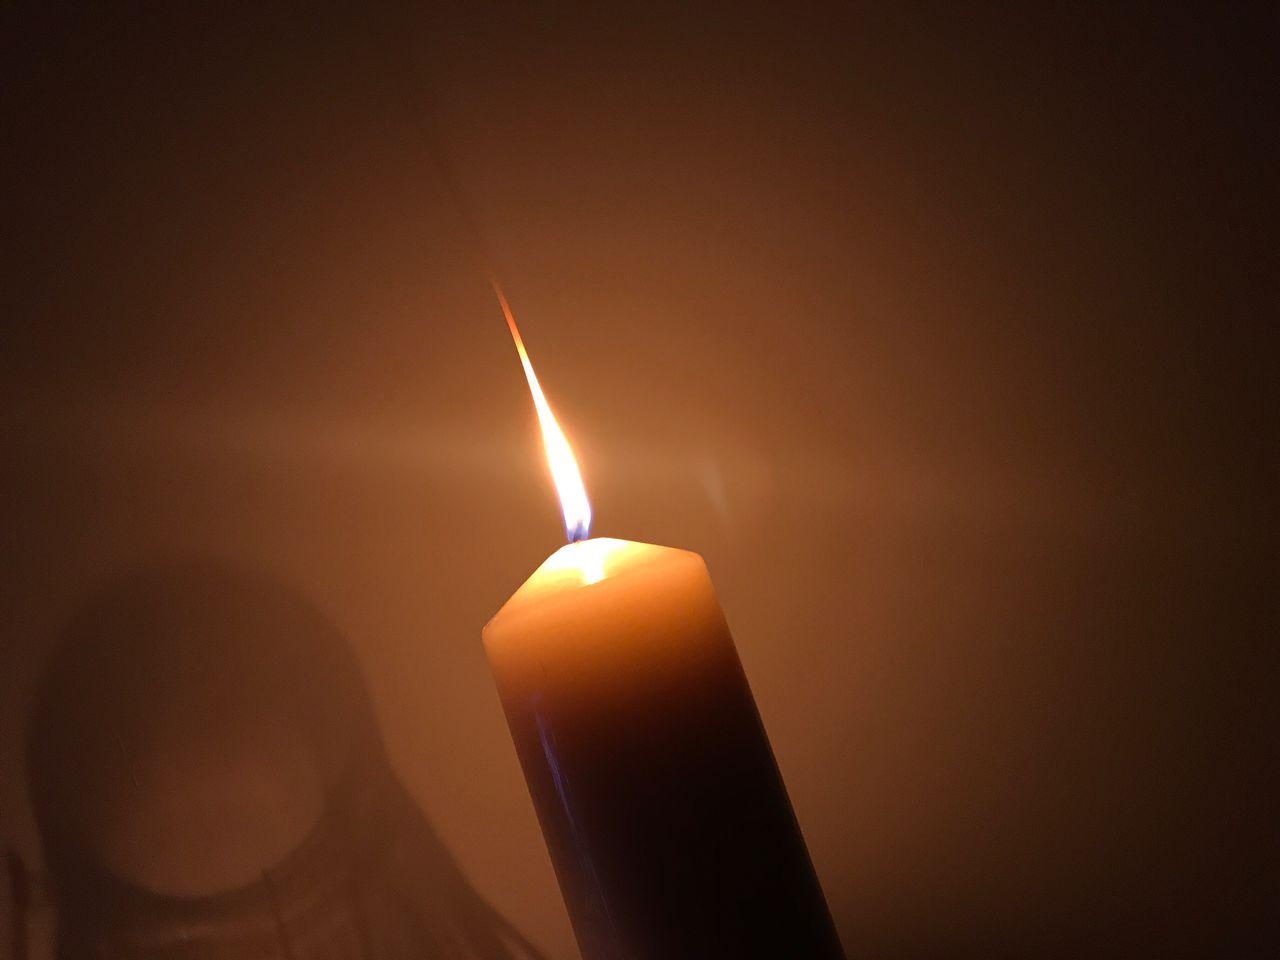 Flame Candle Burning